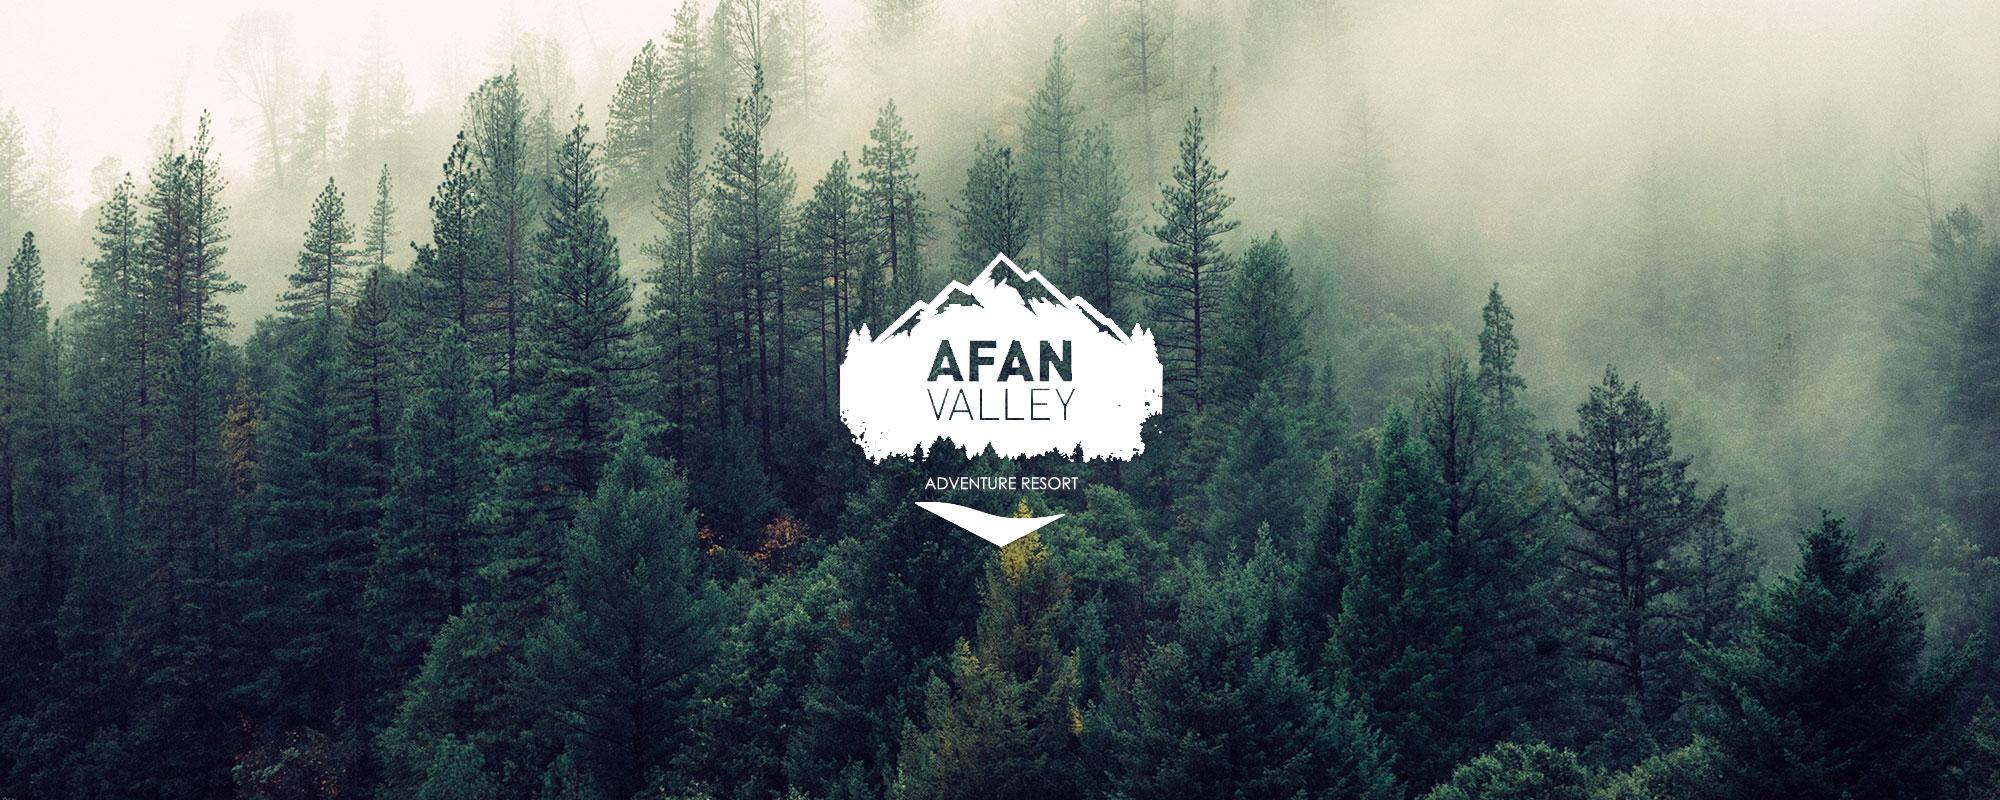 Afan Valley Adventure Resort forest